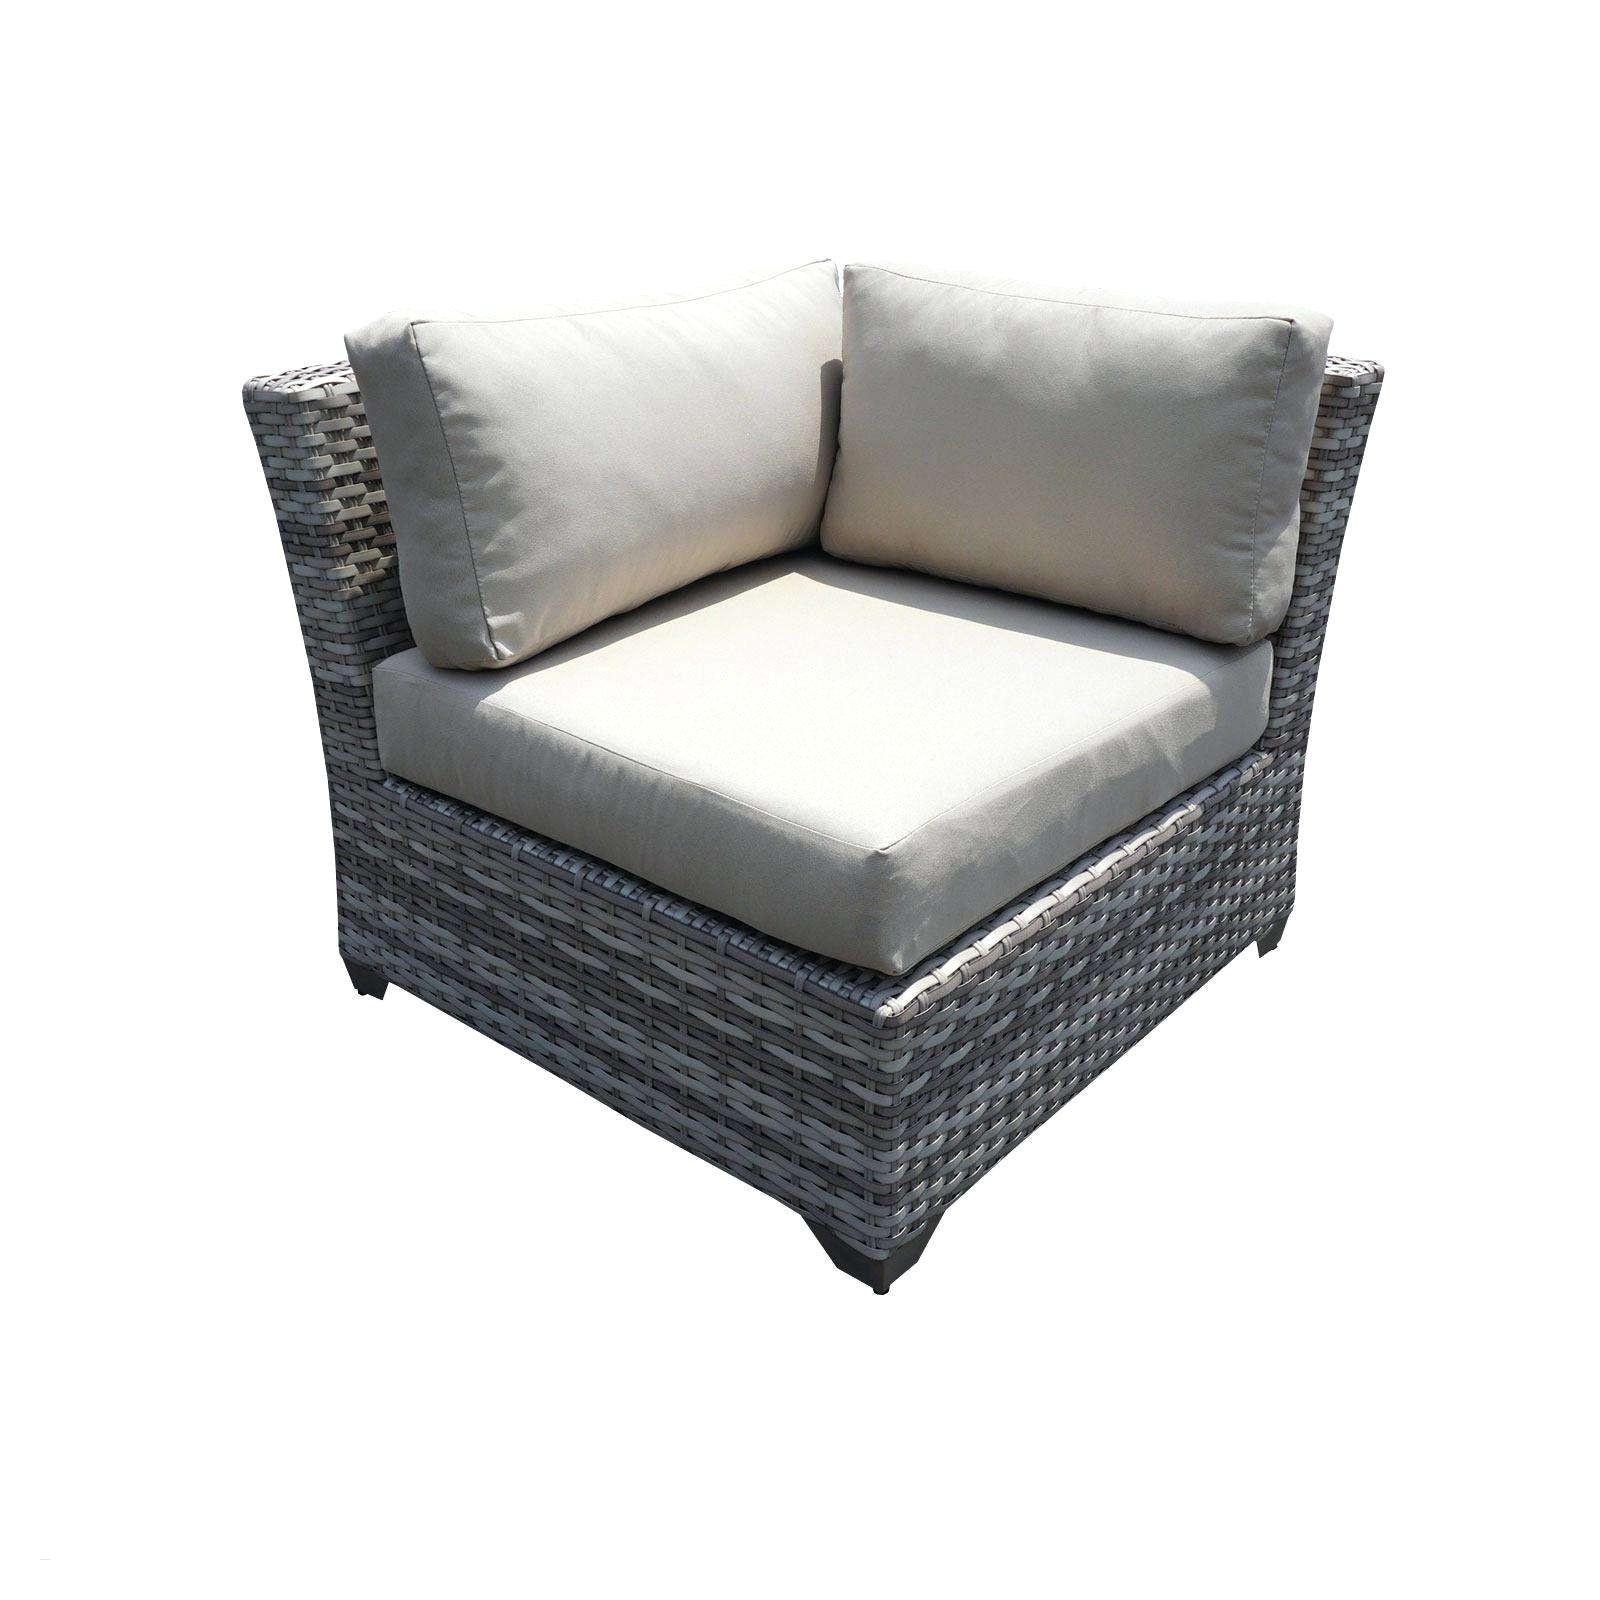 Awesome Ll Bean sofas and Chairs | BradsHomeFurnishings